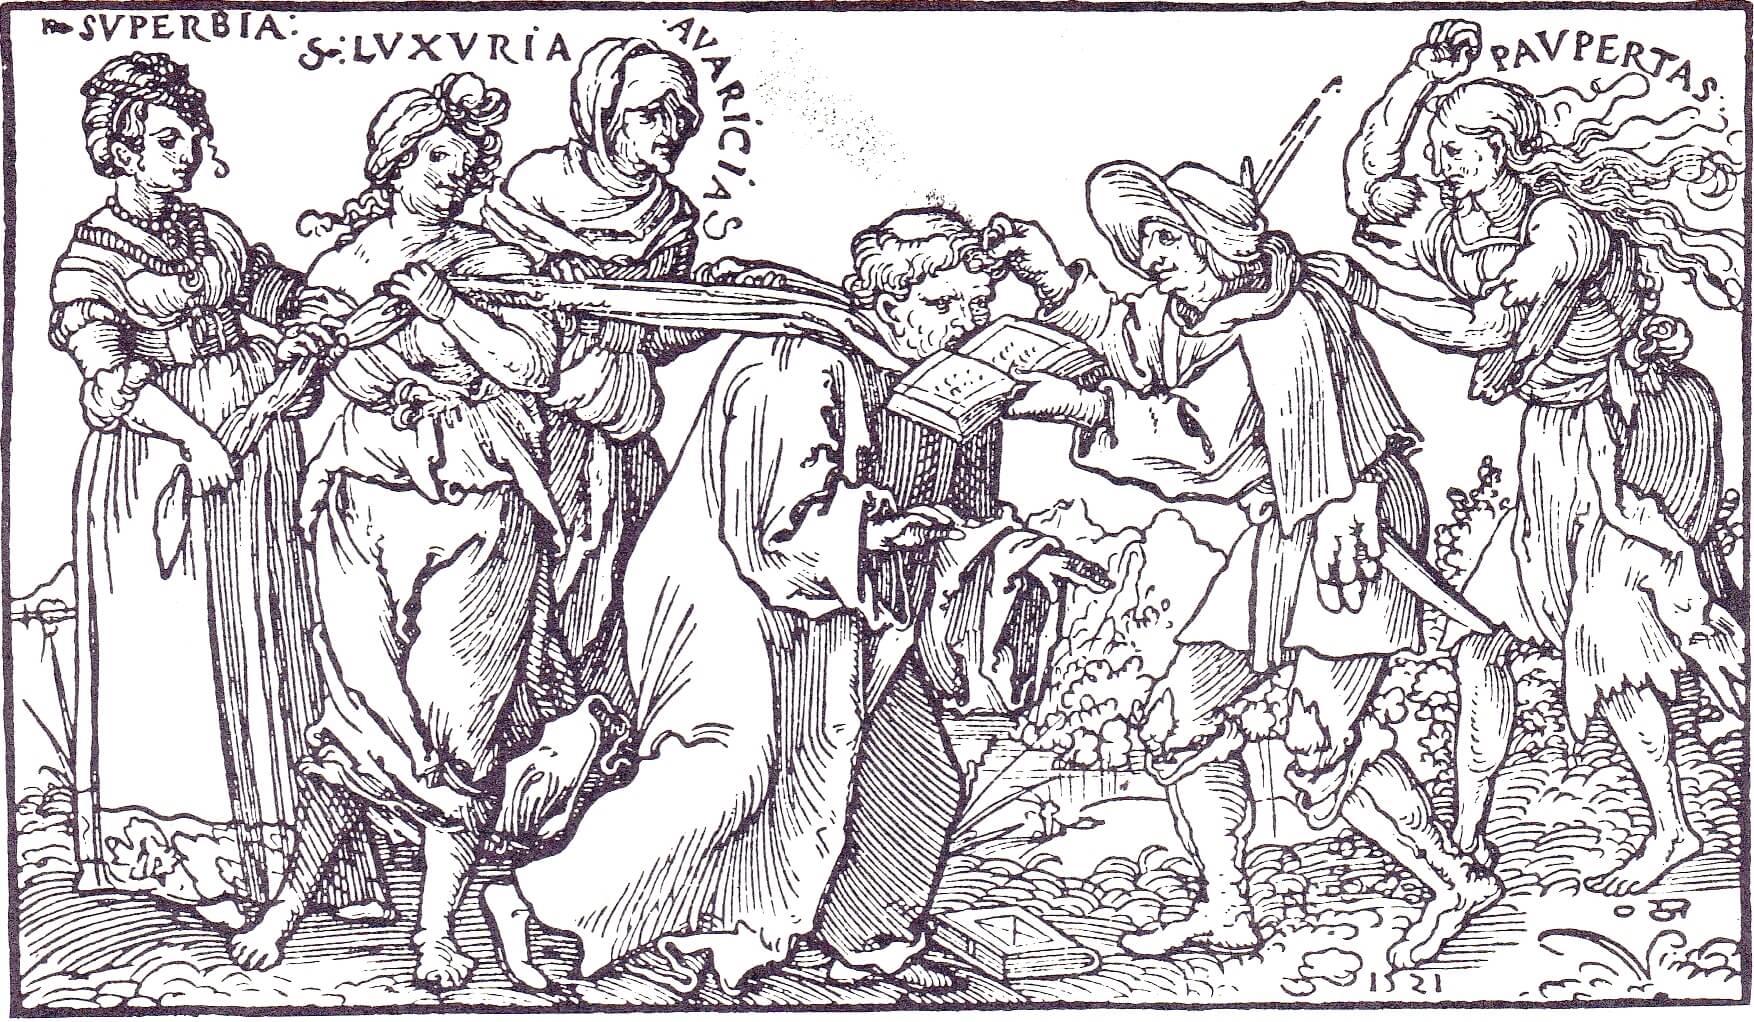 Ганс Себальд Бехам. Аллегория монашества, 1521.